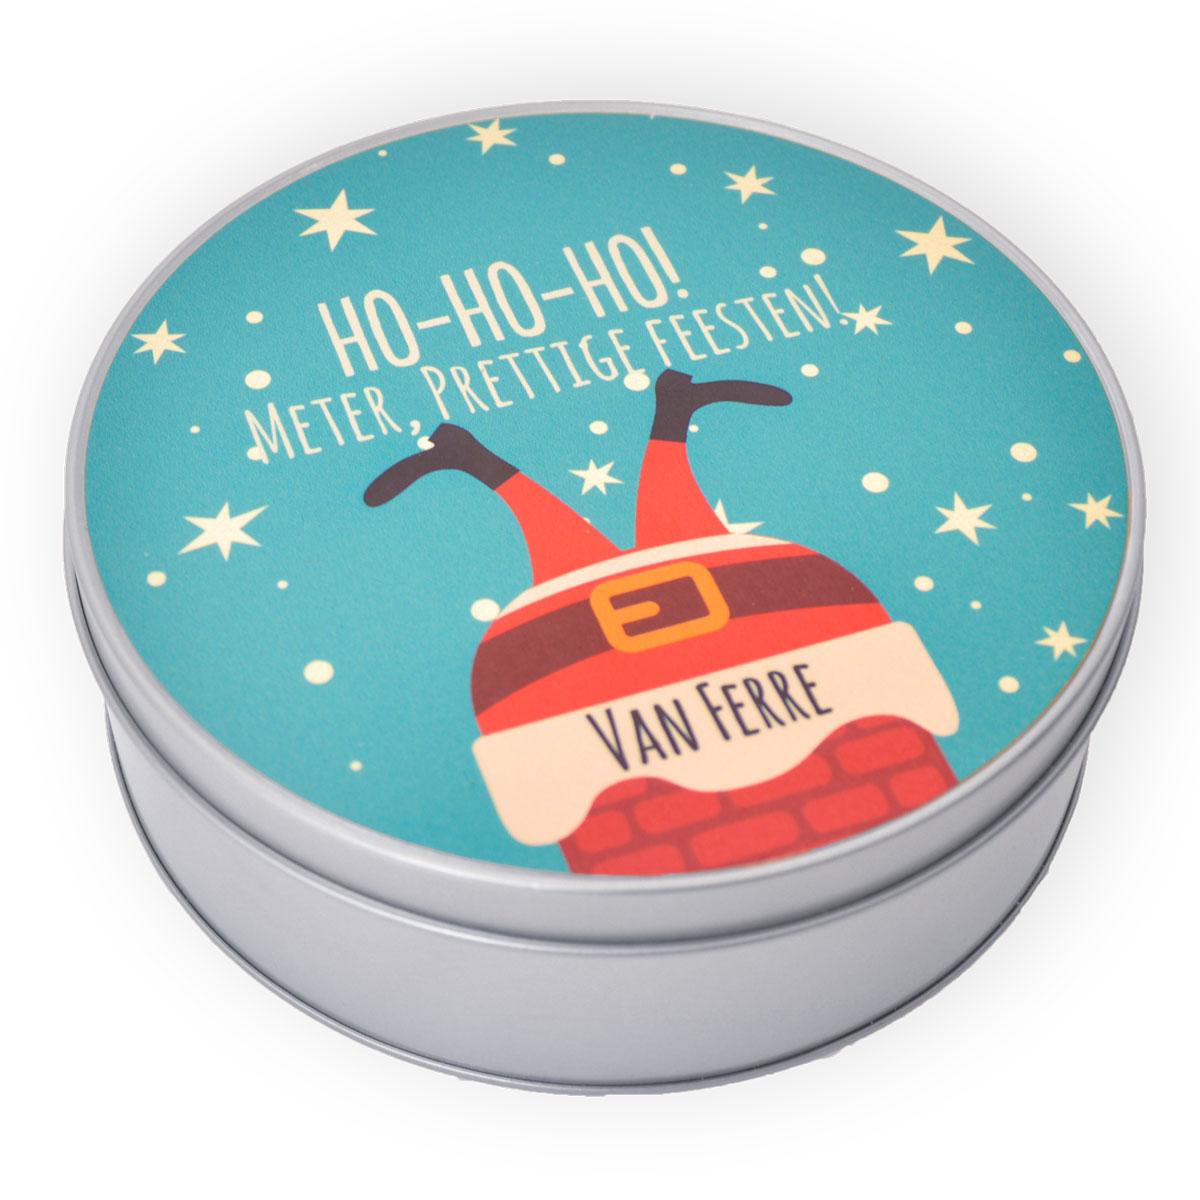 Blikken cadeau doos - gepersonaliseerde koekjestrommel rond